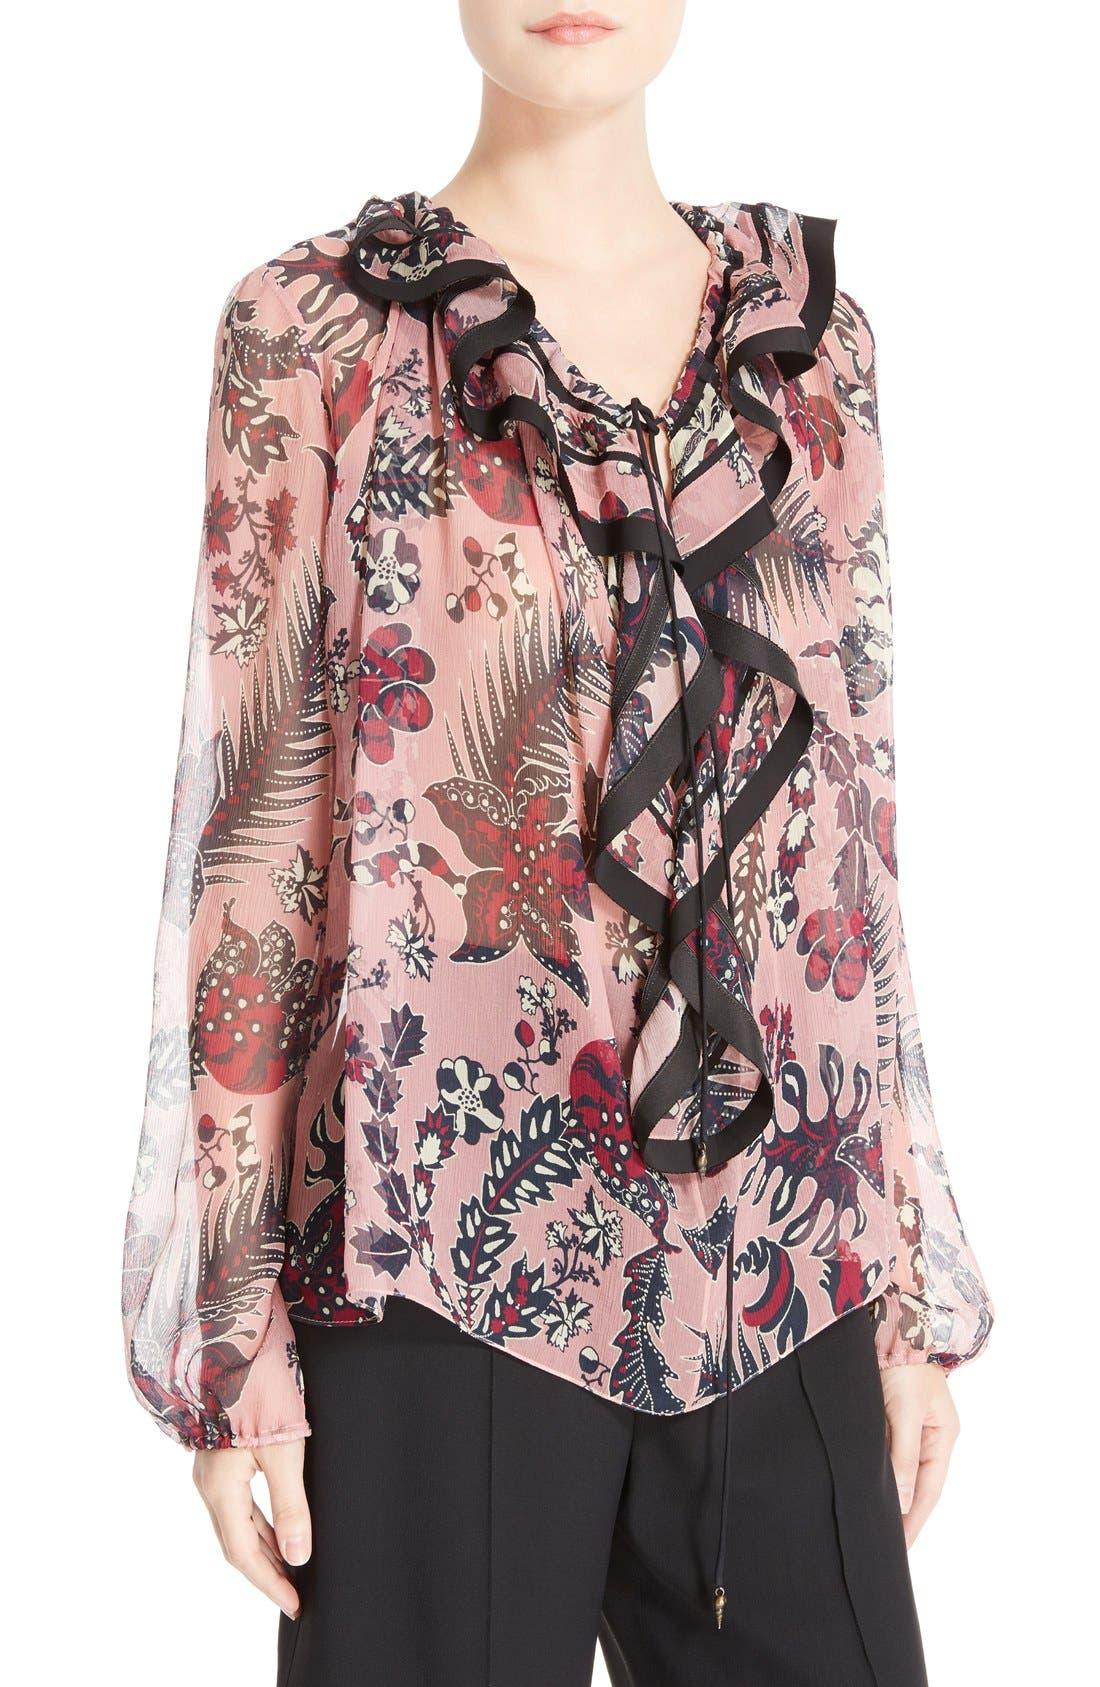 CHLOÉ Floral Print Silk Crepon Blouse